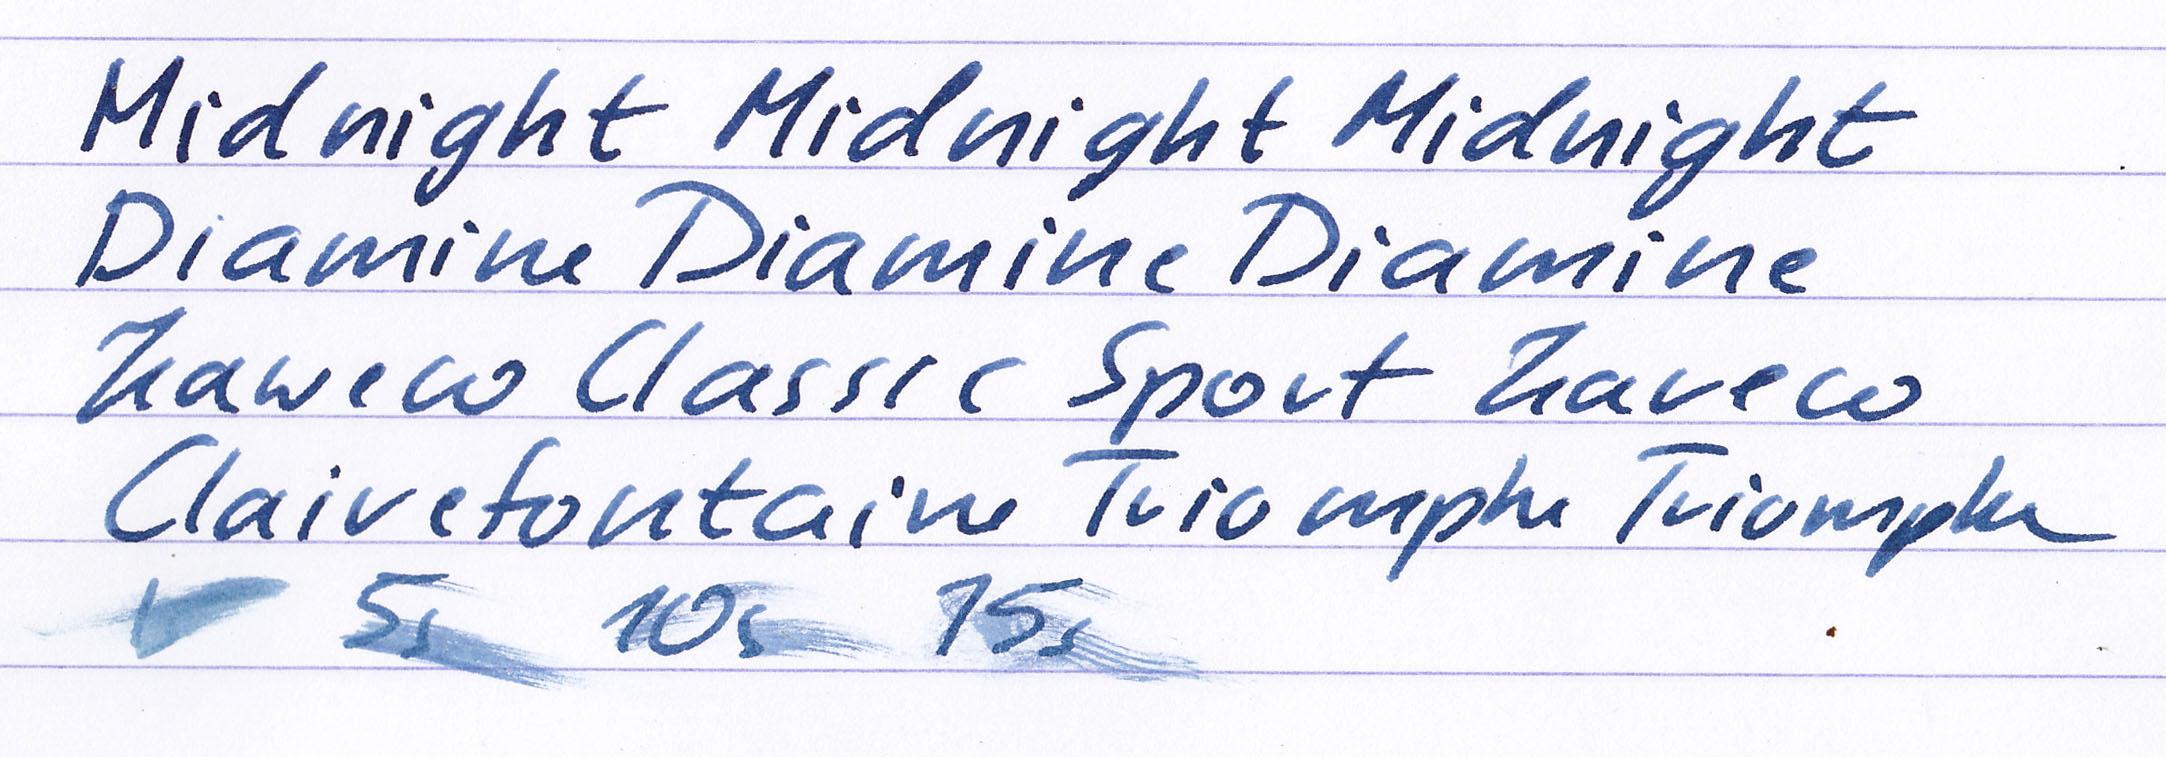 fpn_1463516825__midnight_diamine_lyreco_